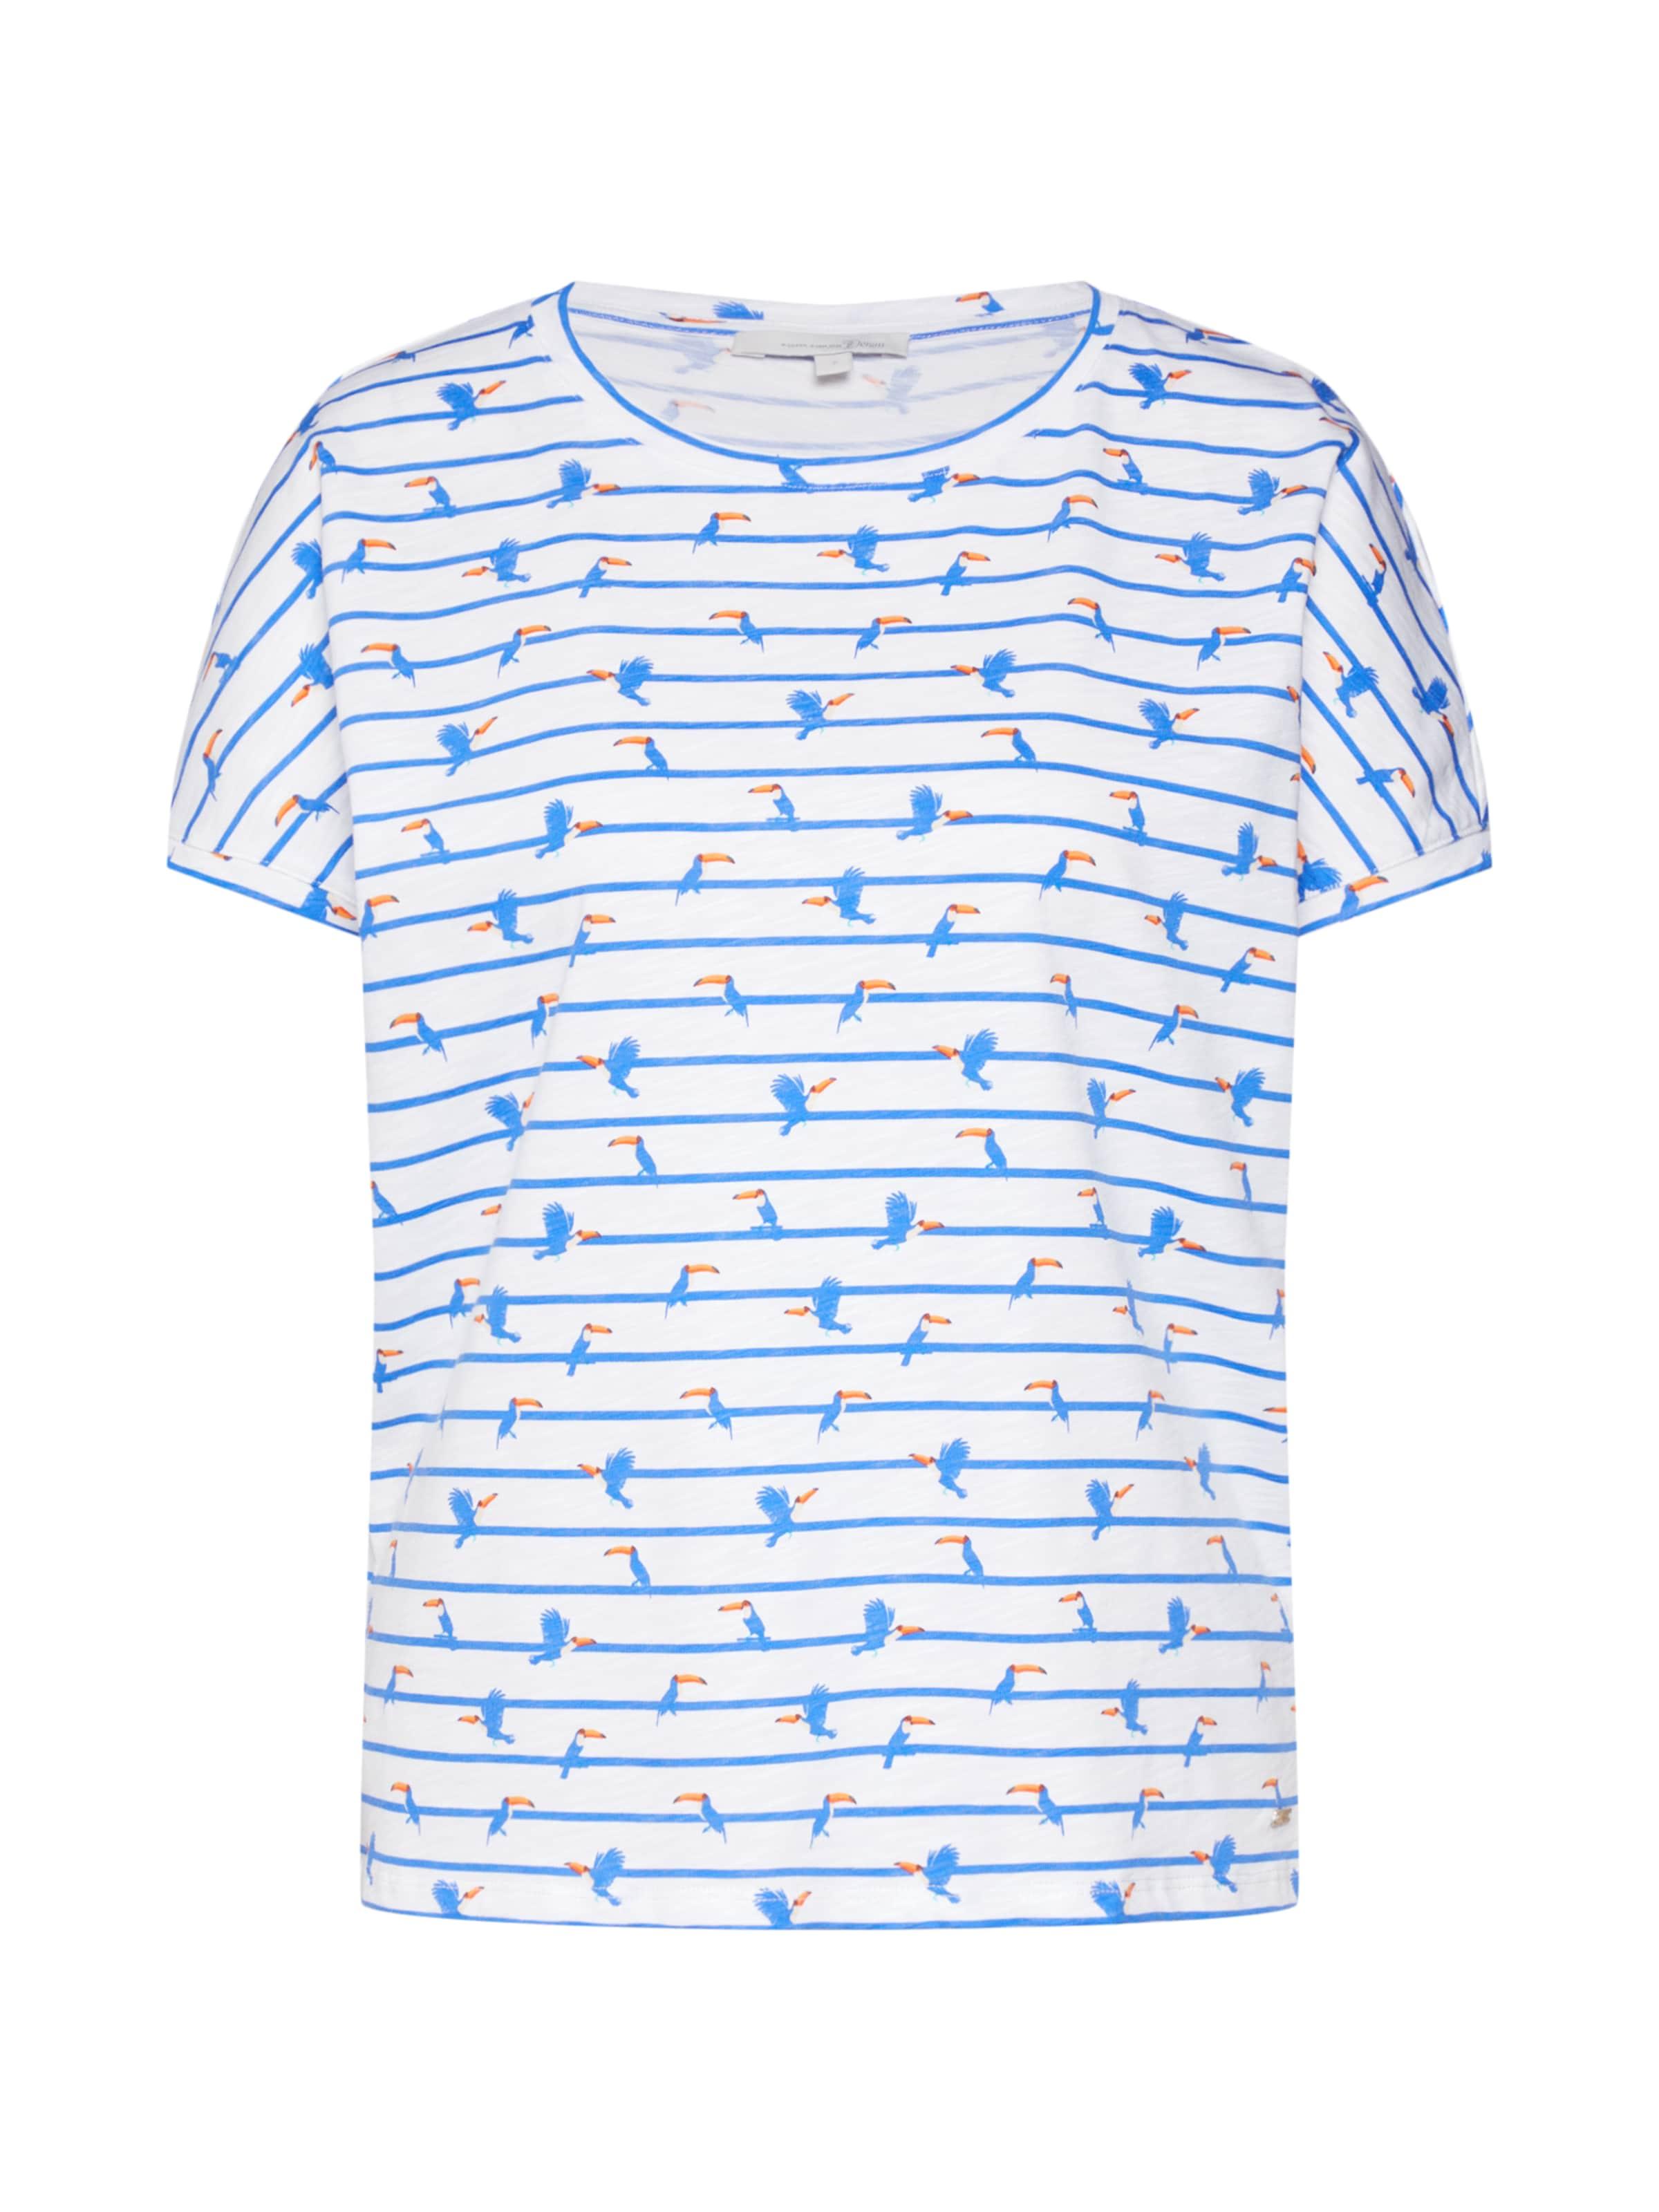 Tee' 'boxy BlauWeiß Tailor Tom In Denim Shirt uFKJ5T1cl3